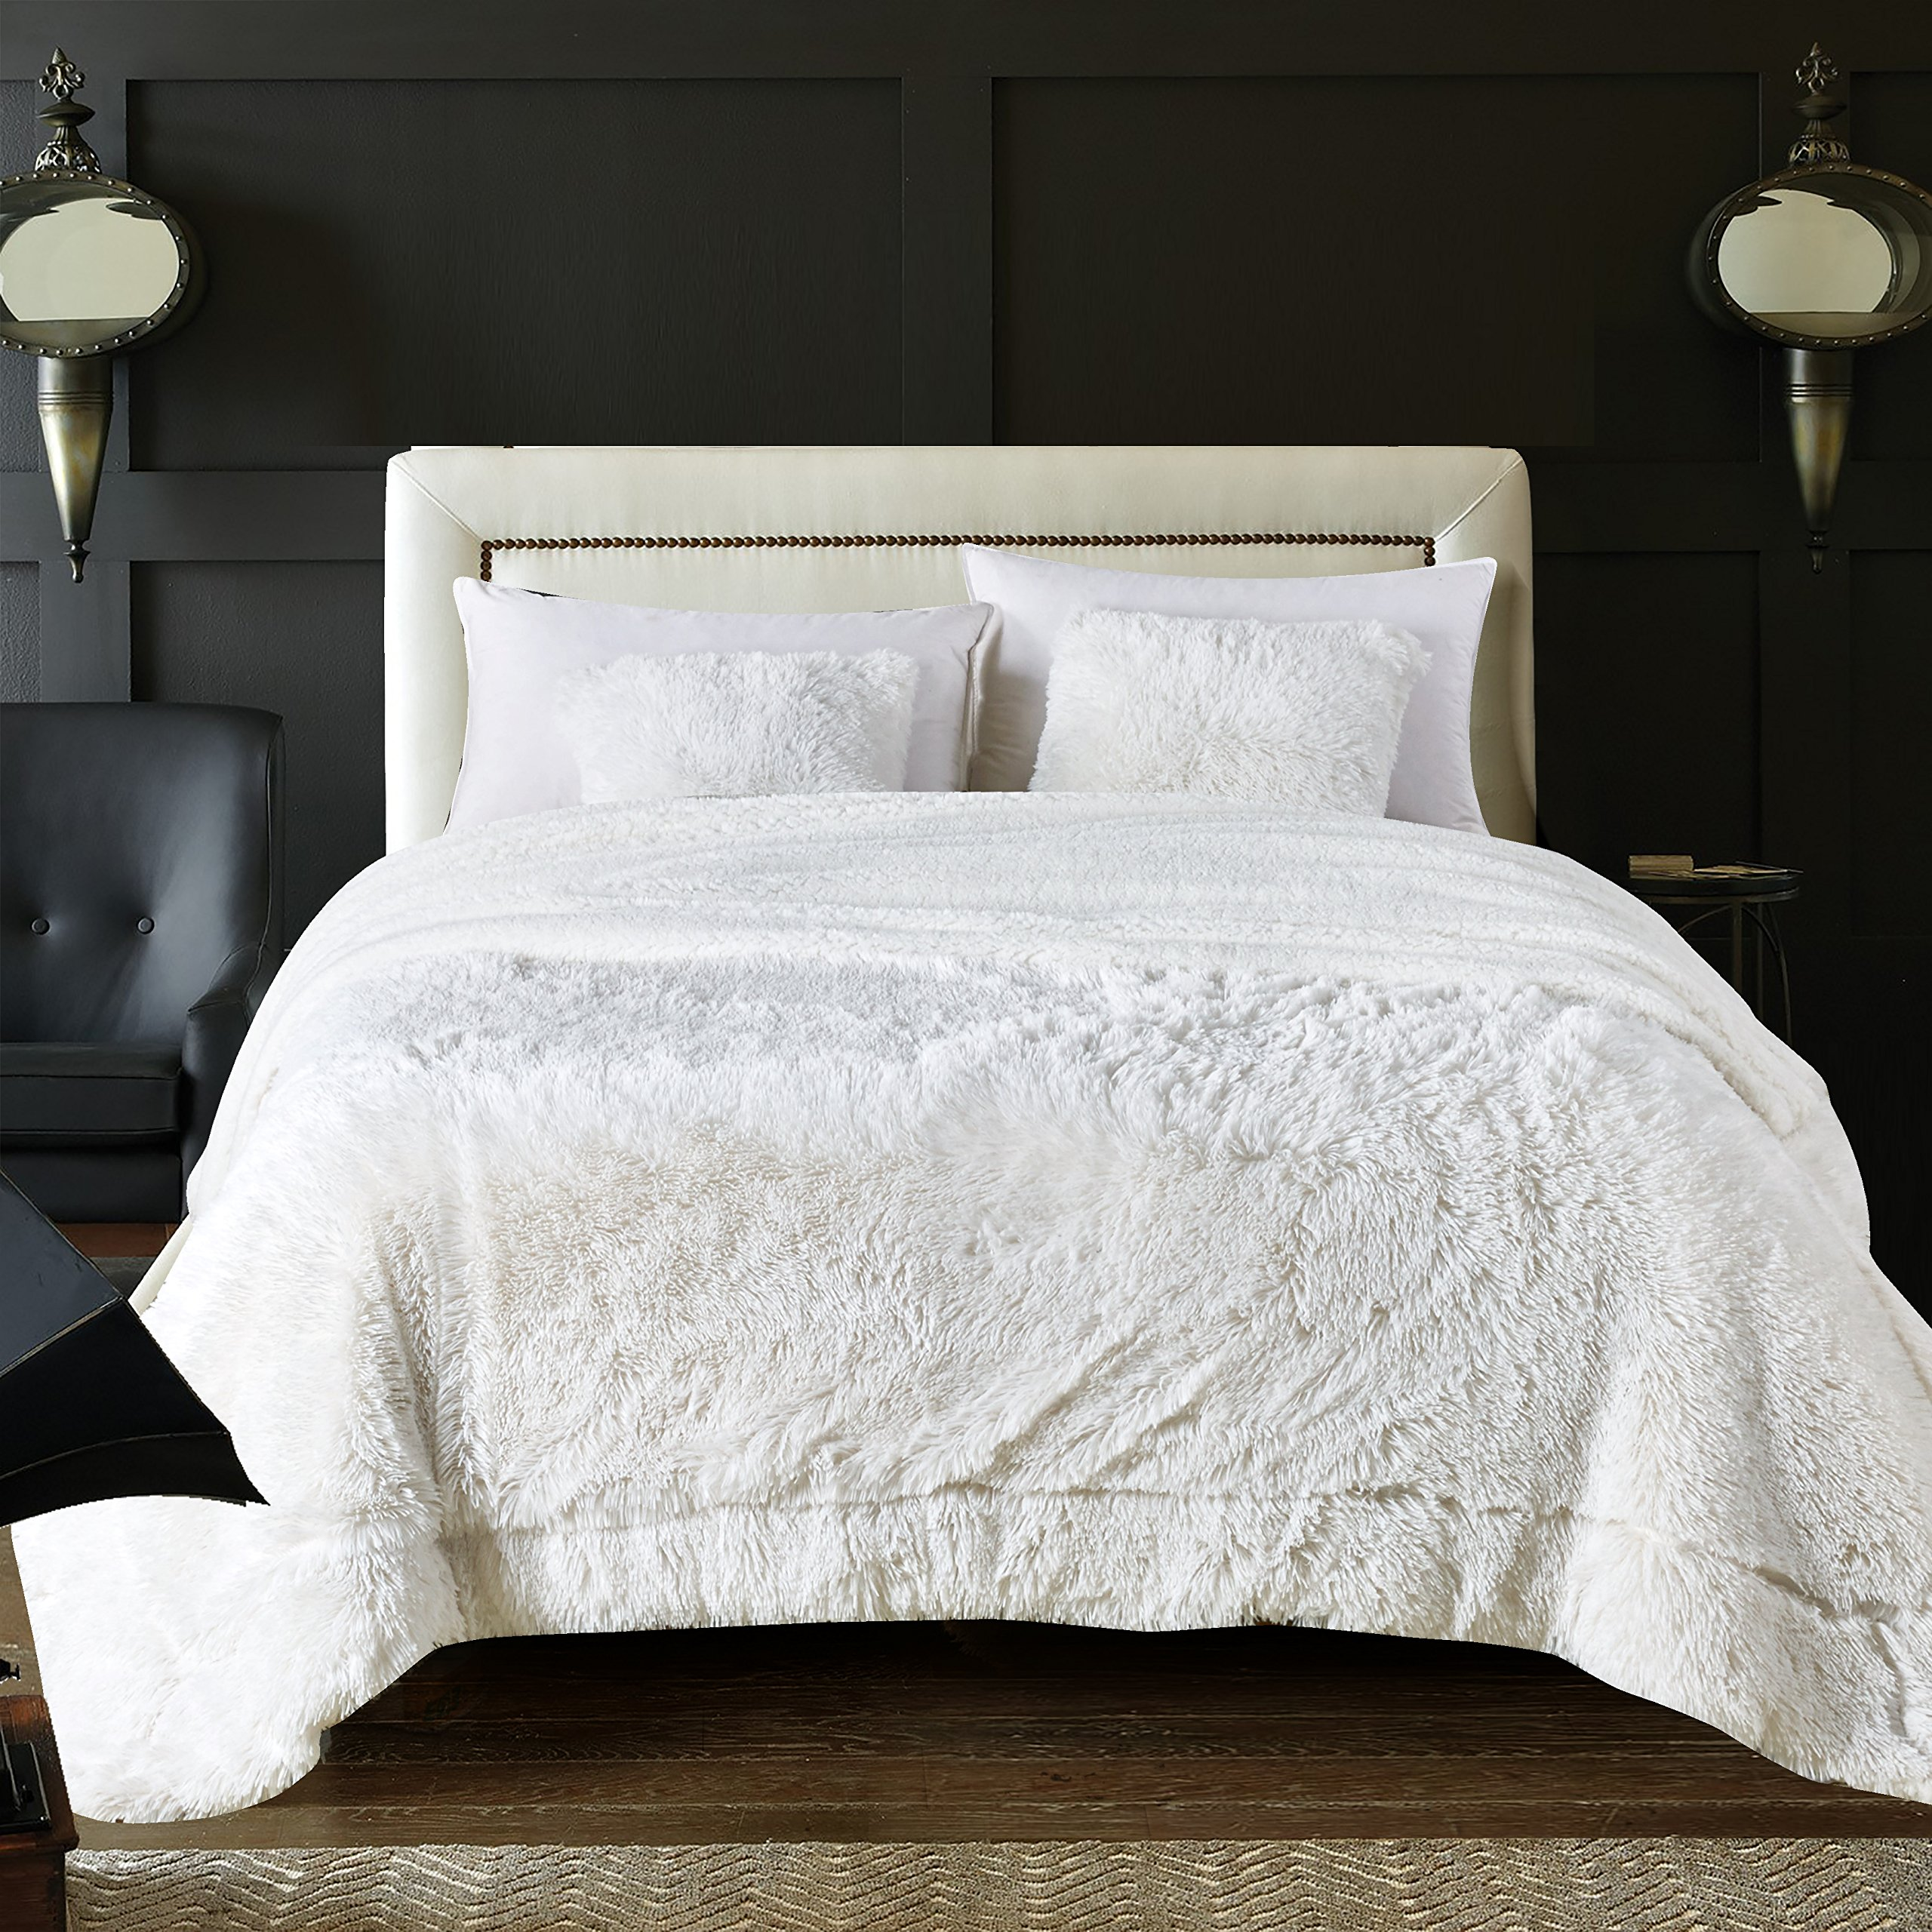 Chanasya Super Soft Shaggy Longfur Throw Blanket | Snuggly Fuzzy Faux Fur Lightweight Warm Elegant Cozy Plush Sherpa Fleece Microfiber Blanket | for Bed Couch Living Bed Room - King - White by Chanasya